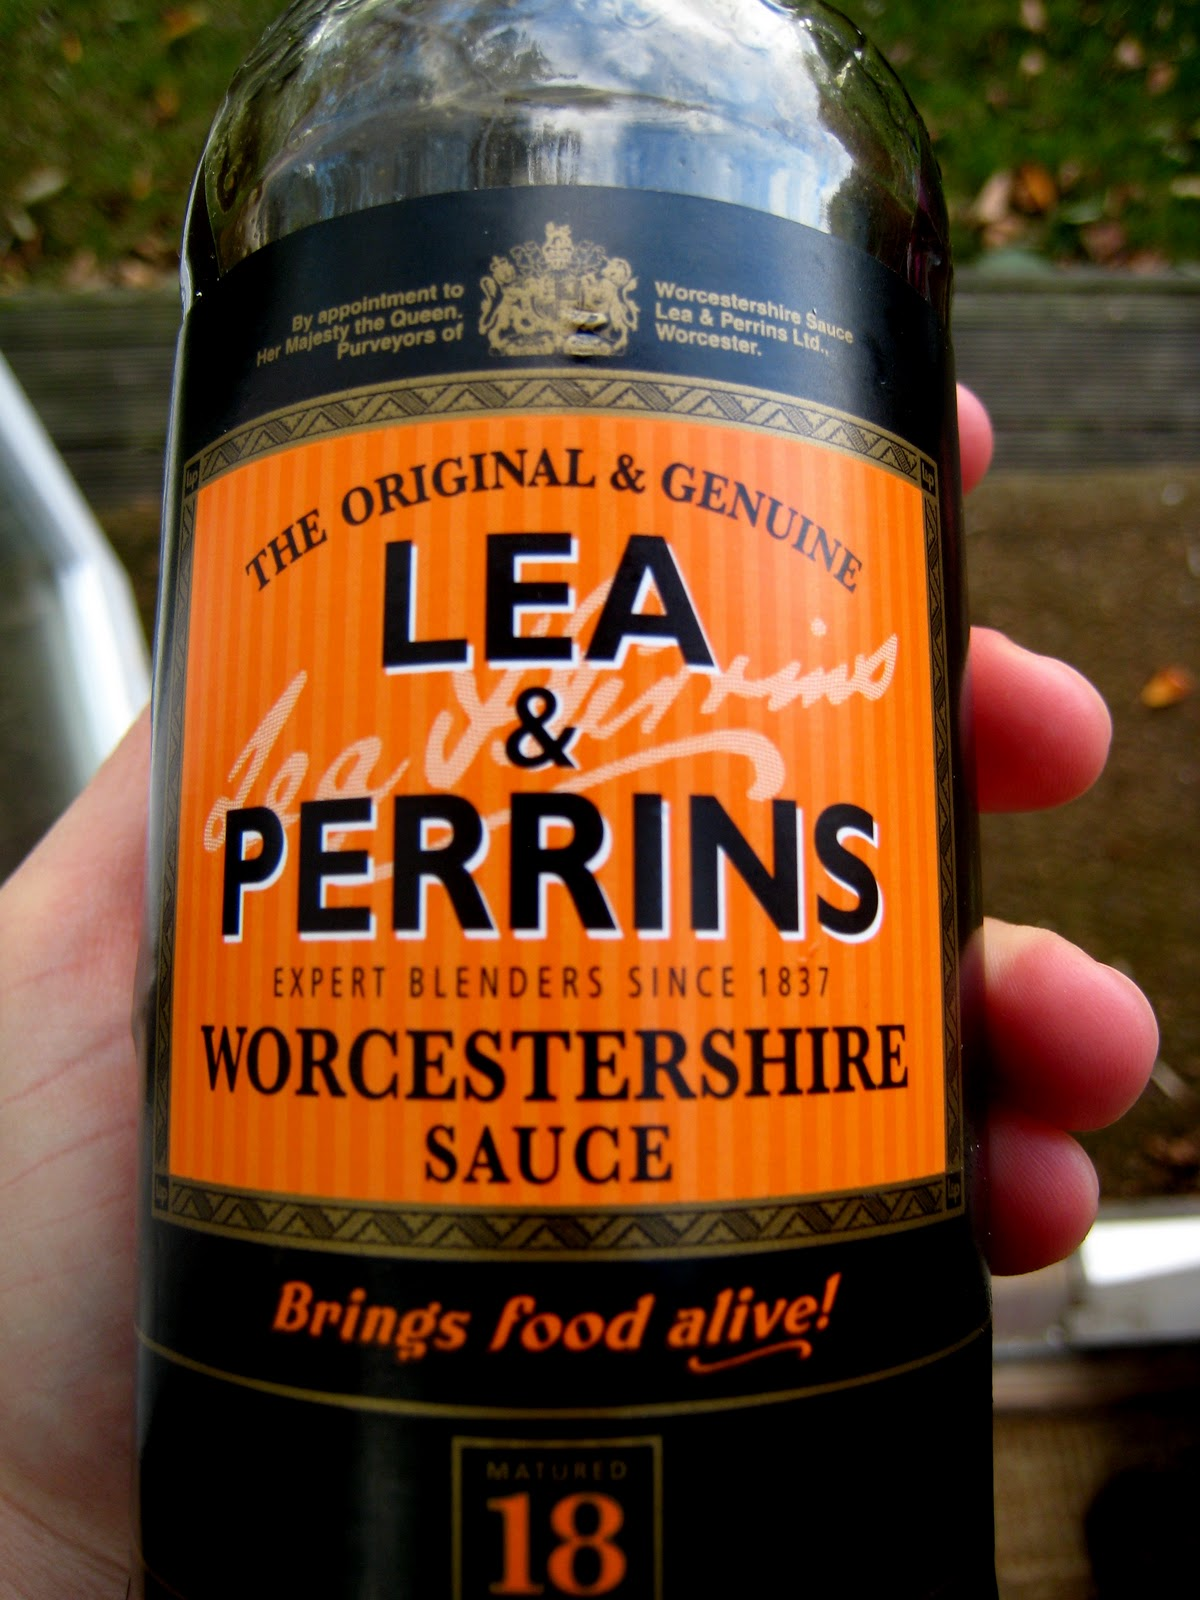 Worcestershire Sauce Ingredients Watermelon Wallpaper Rainbow Find Free HD for Desktop [freshlhys.tk]